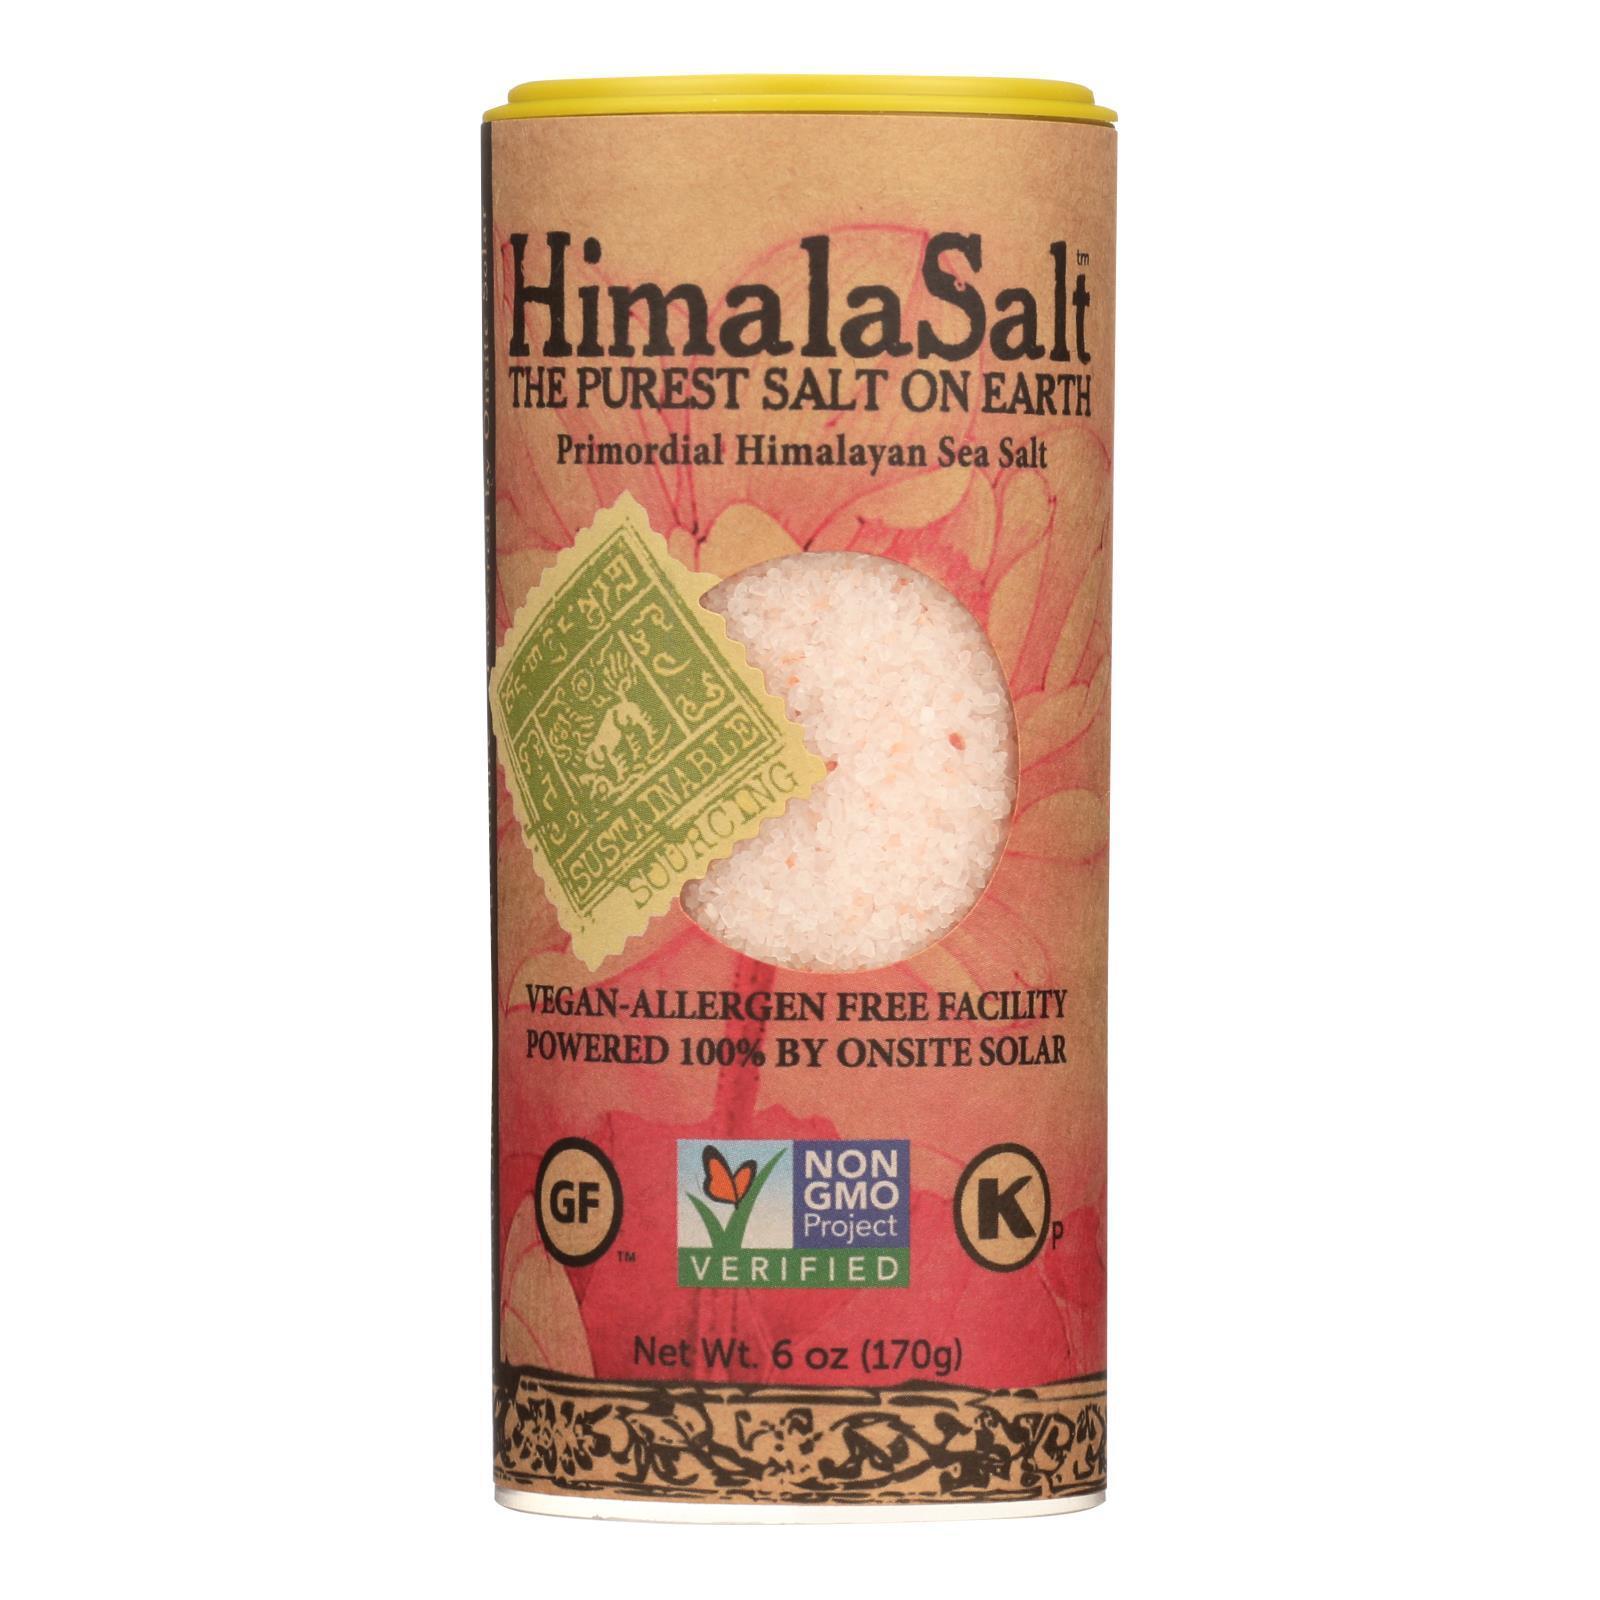 Himalasalt Primordial Himalayan Sea Salt - Fine Grain - Shaker - 6 oz - Case of 6